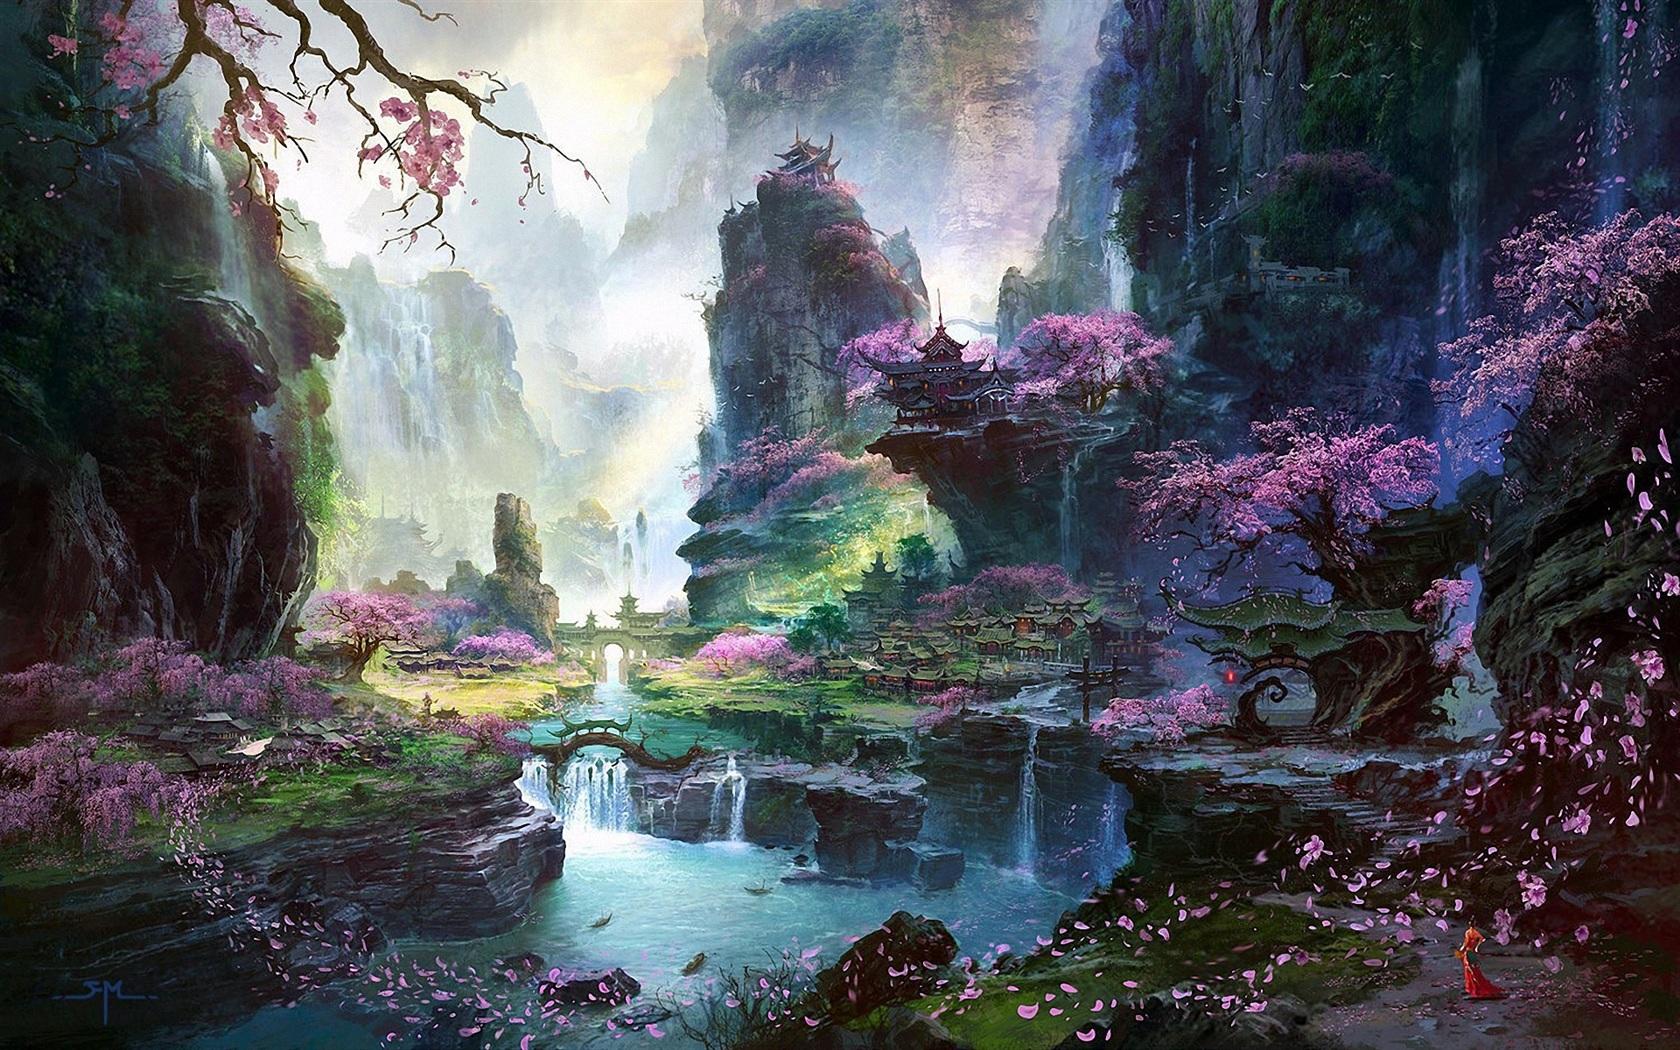 1680x1050 Hd Wallpaper Fantastic World Painting Oriental Spring Landscapes